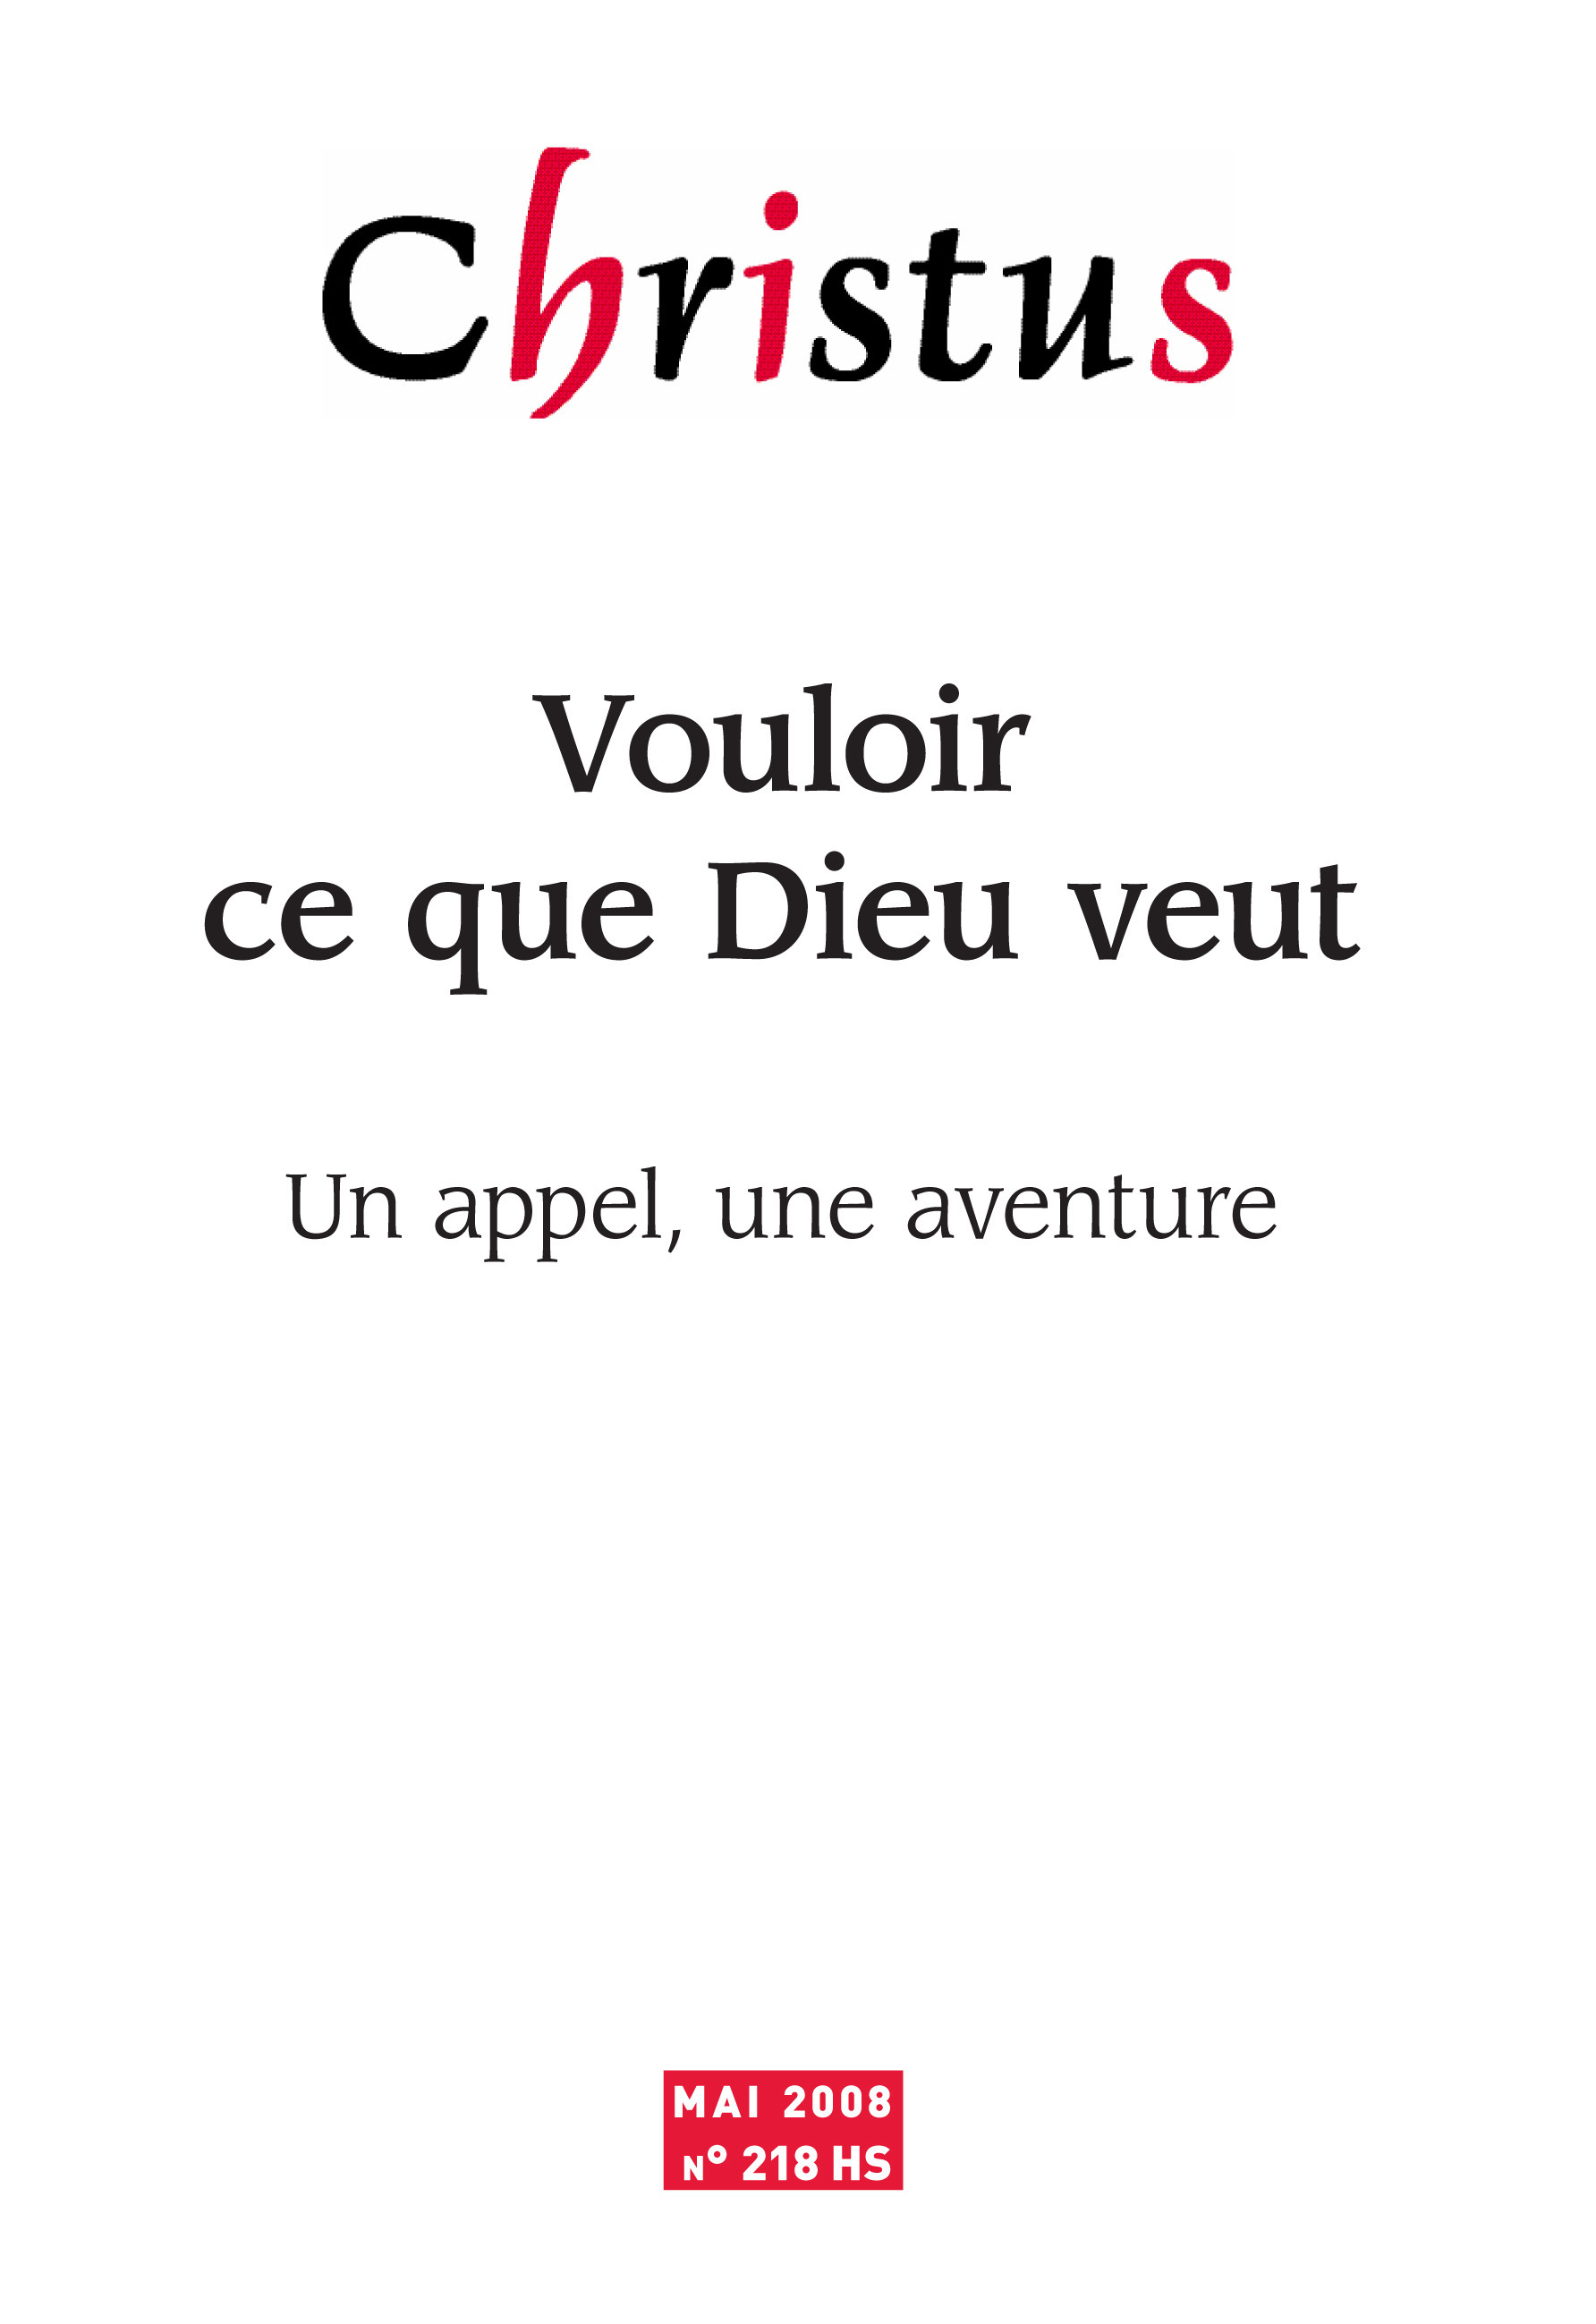 Revue christus ; Christus Hors-Série 2008